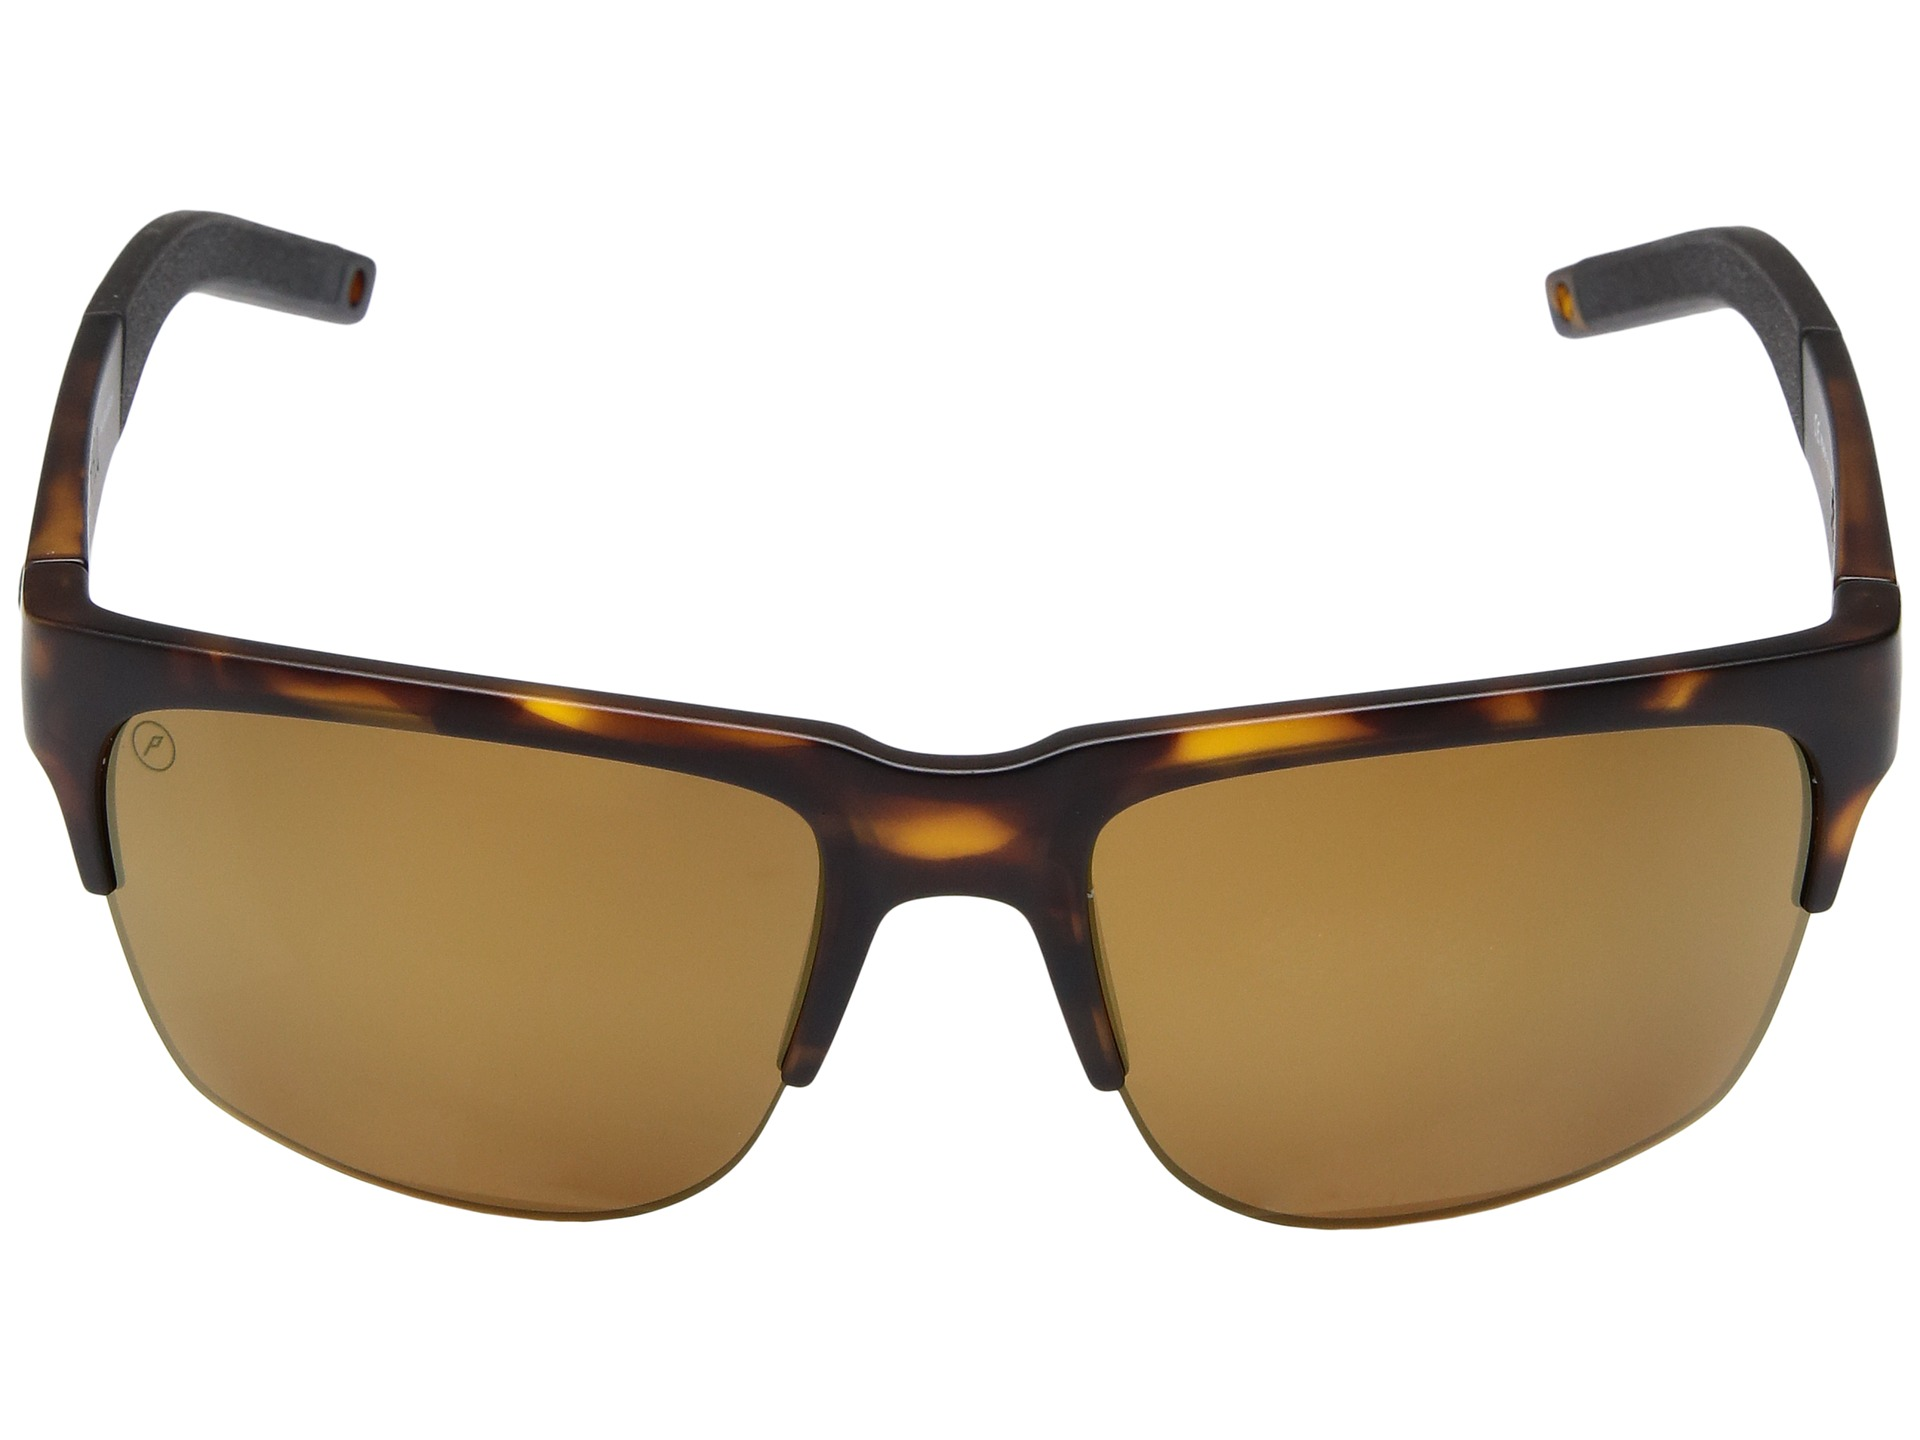 Electric Eyewear Knoxville Pro Polarized Plus at Zappos.com